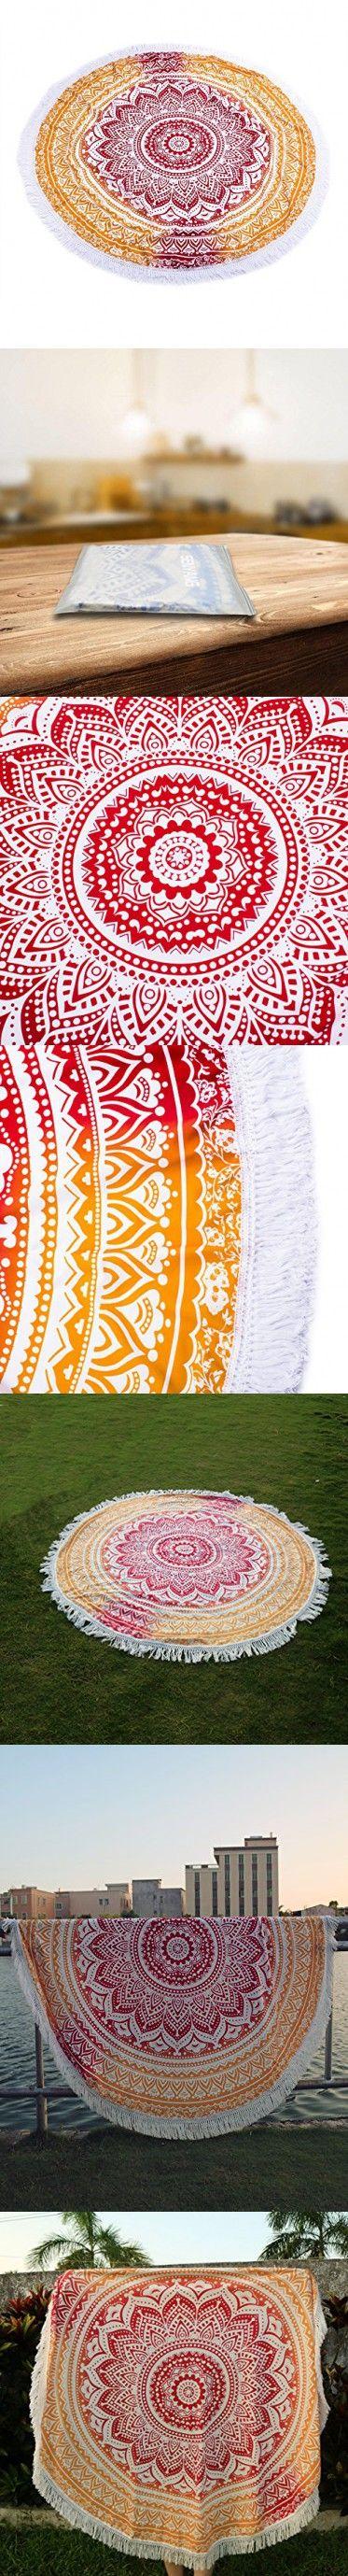 Popular Handicrafts Round Beach Throw - SENYANG Mandala Tassel Fringe Tapestry, Yoga Mat, Picnic Mat , Table throw, Table Cloth, Picnic Blanket ShawlBest Choice for Beach Travel and Home Decor